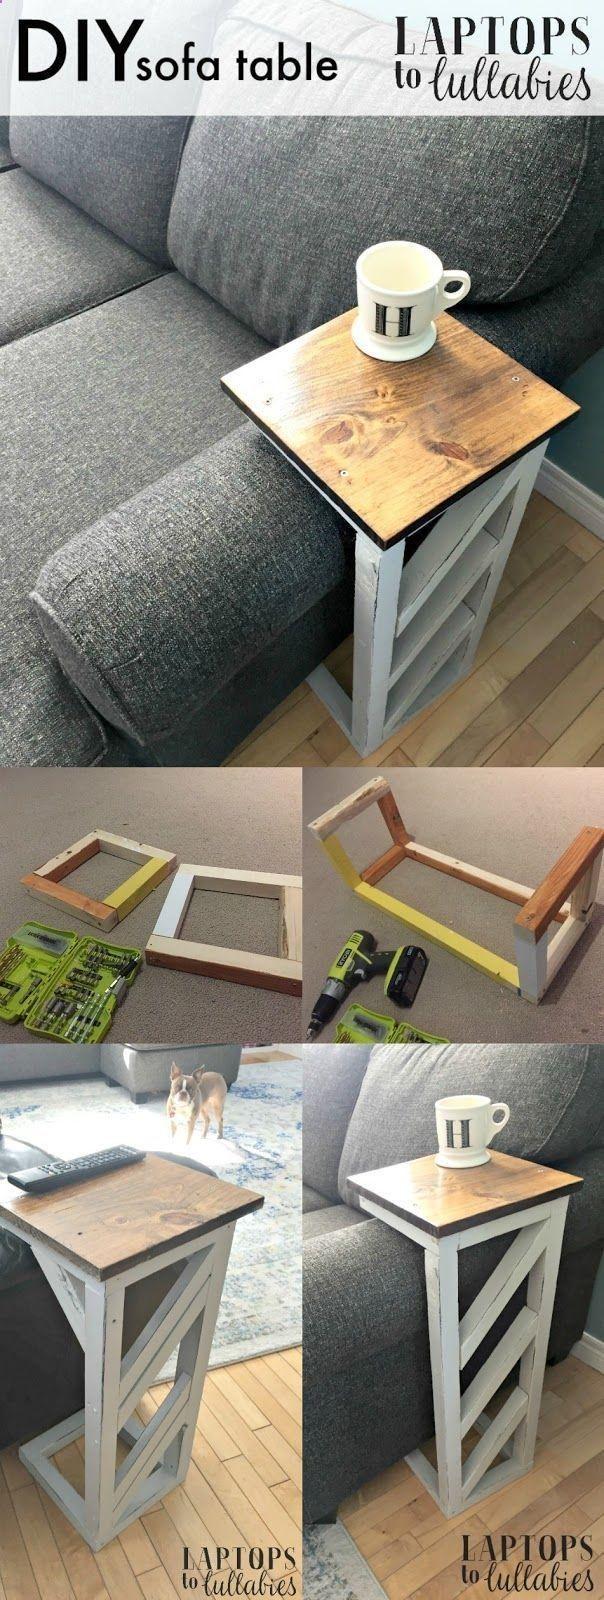 Teds wood working diy life hacks crafts laptops to lullabies